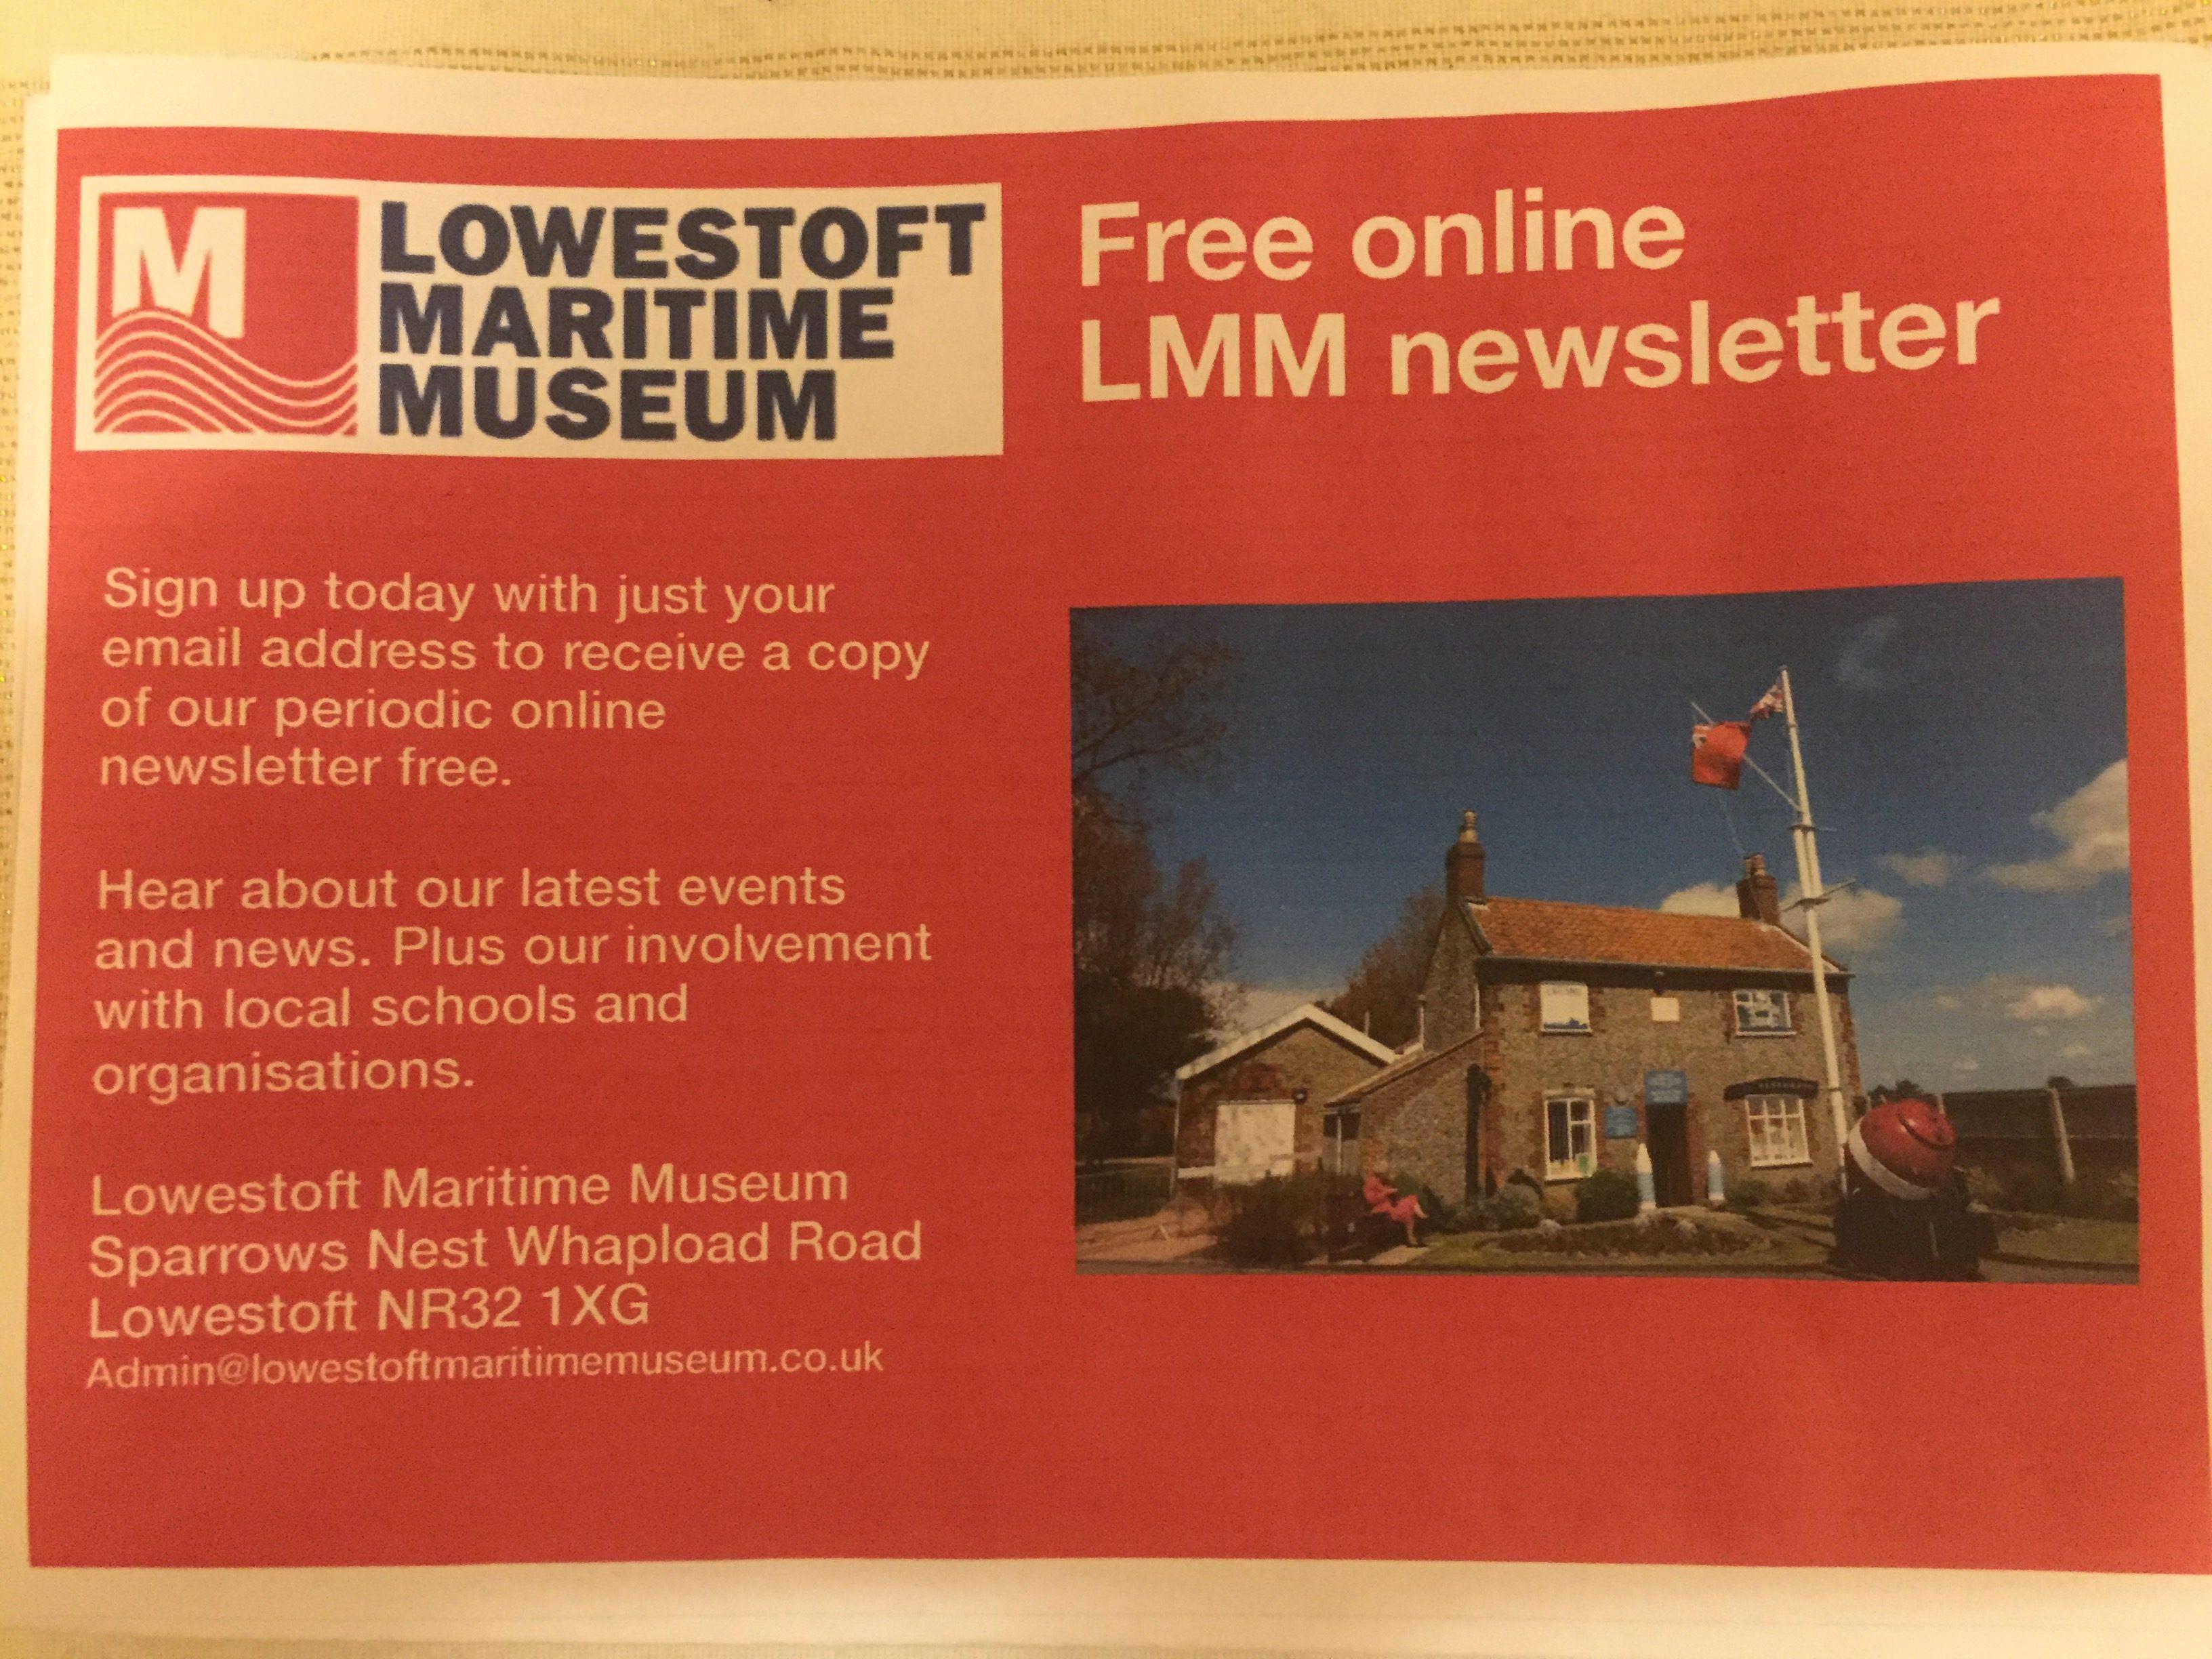 LMM free online Newsletter